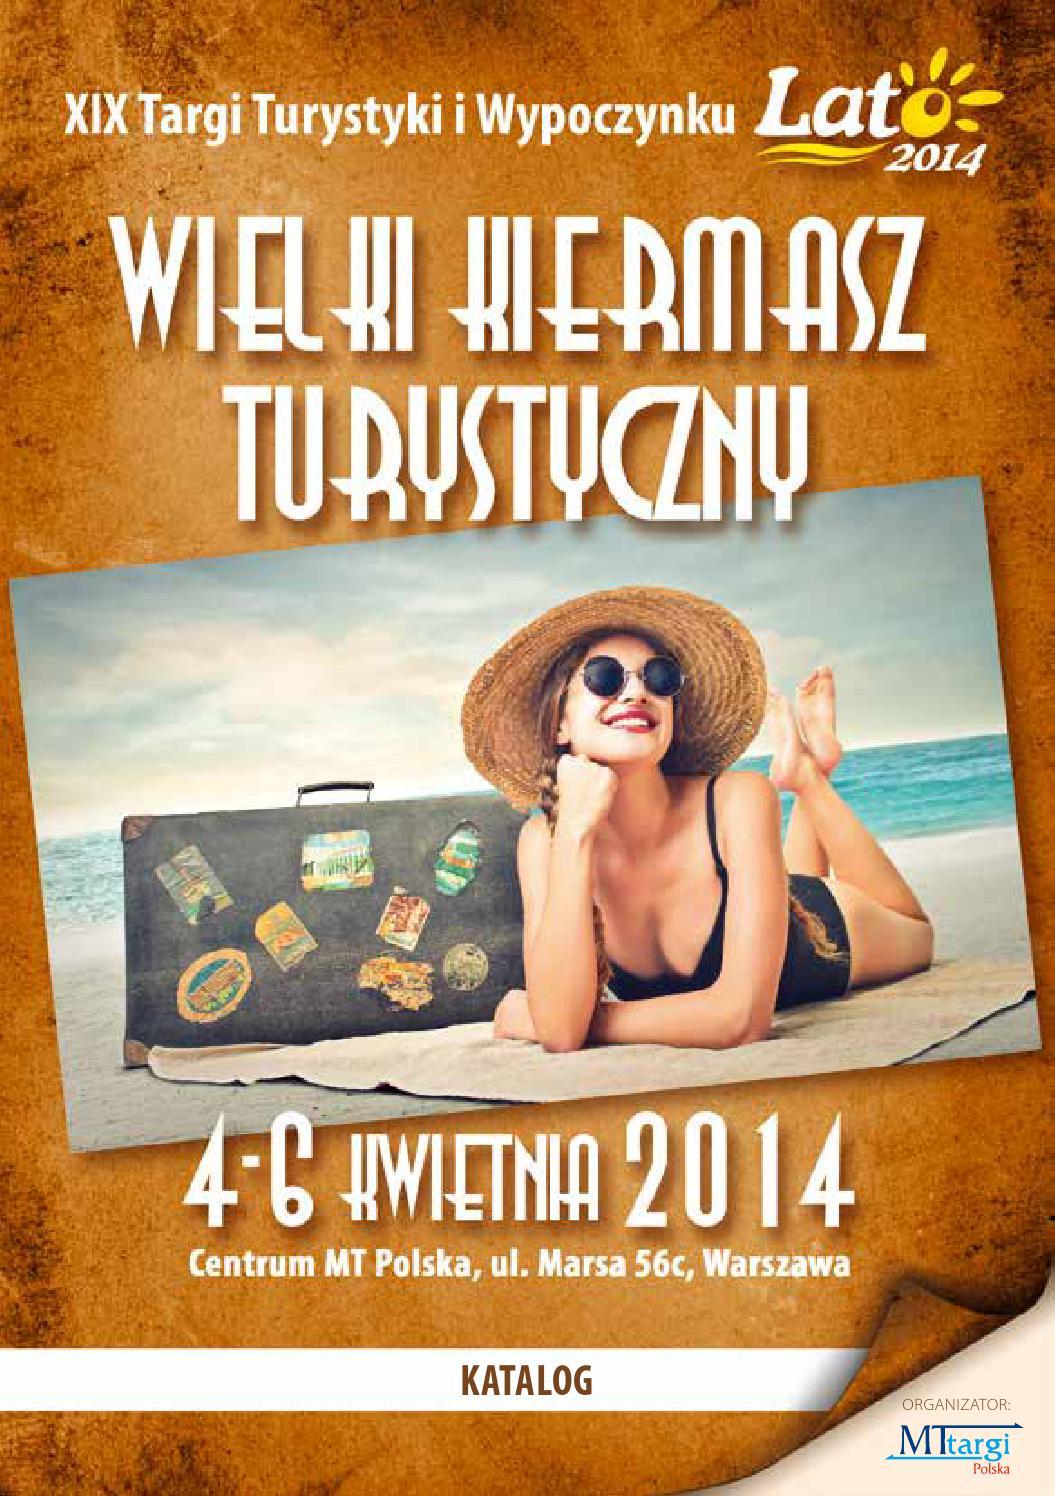 Czyewska, Herbert, Kiciska - Weekend w scae-championships.com